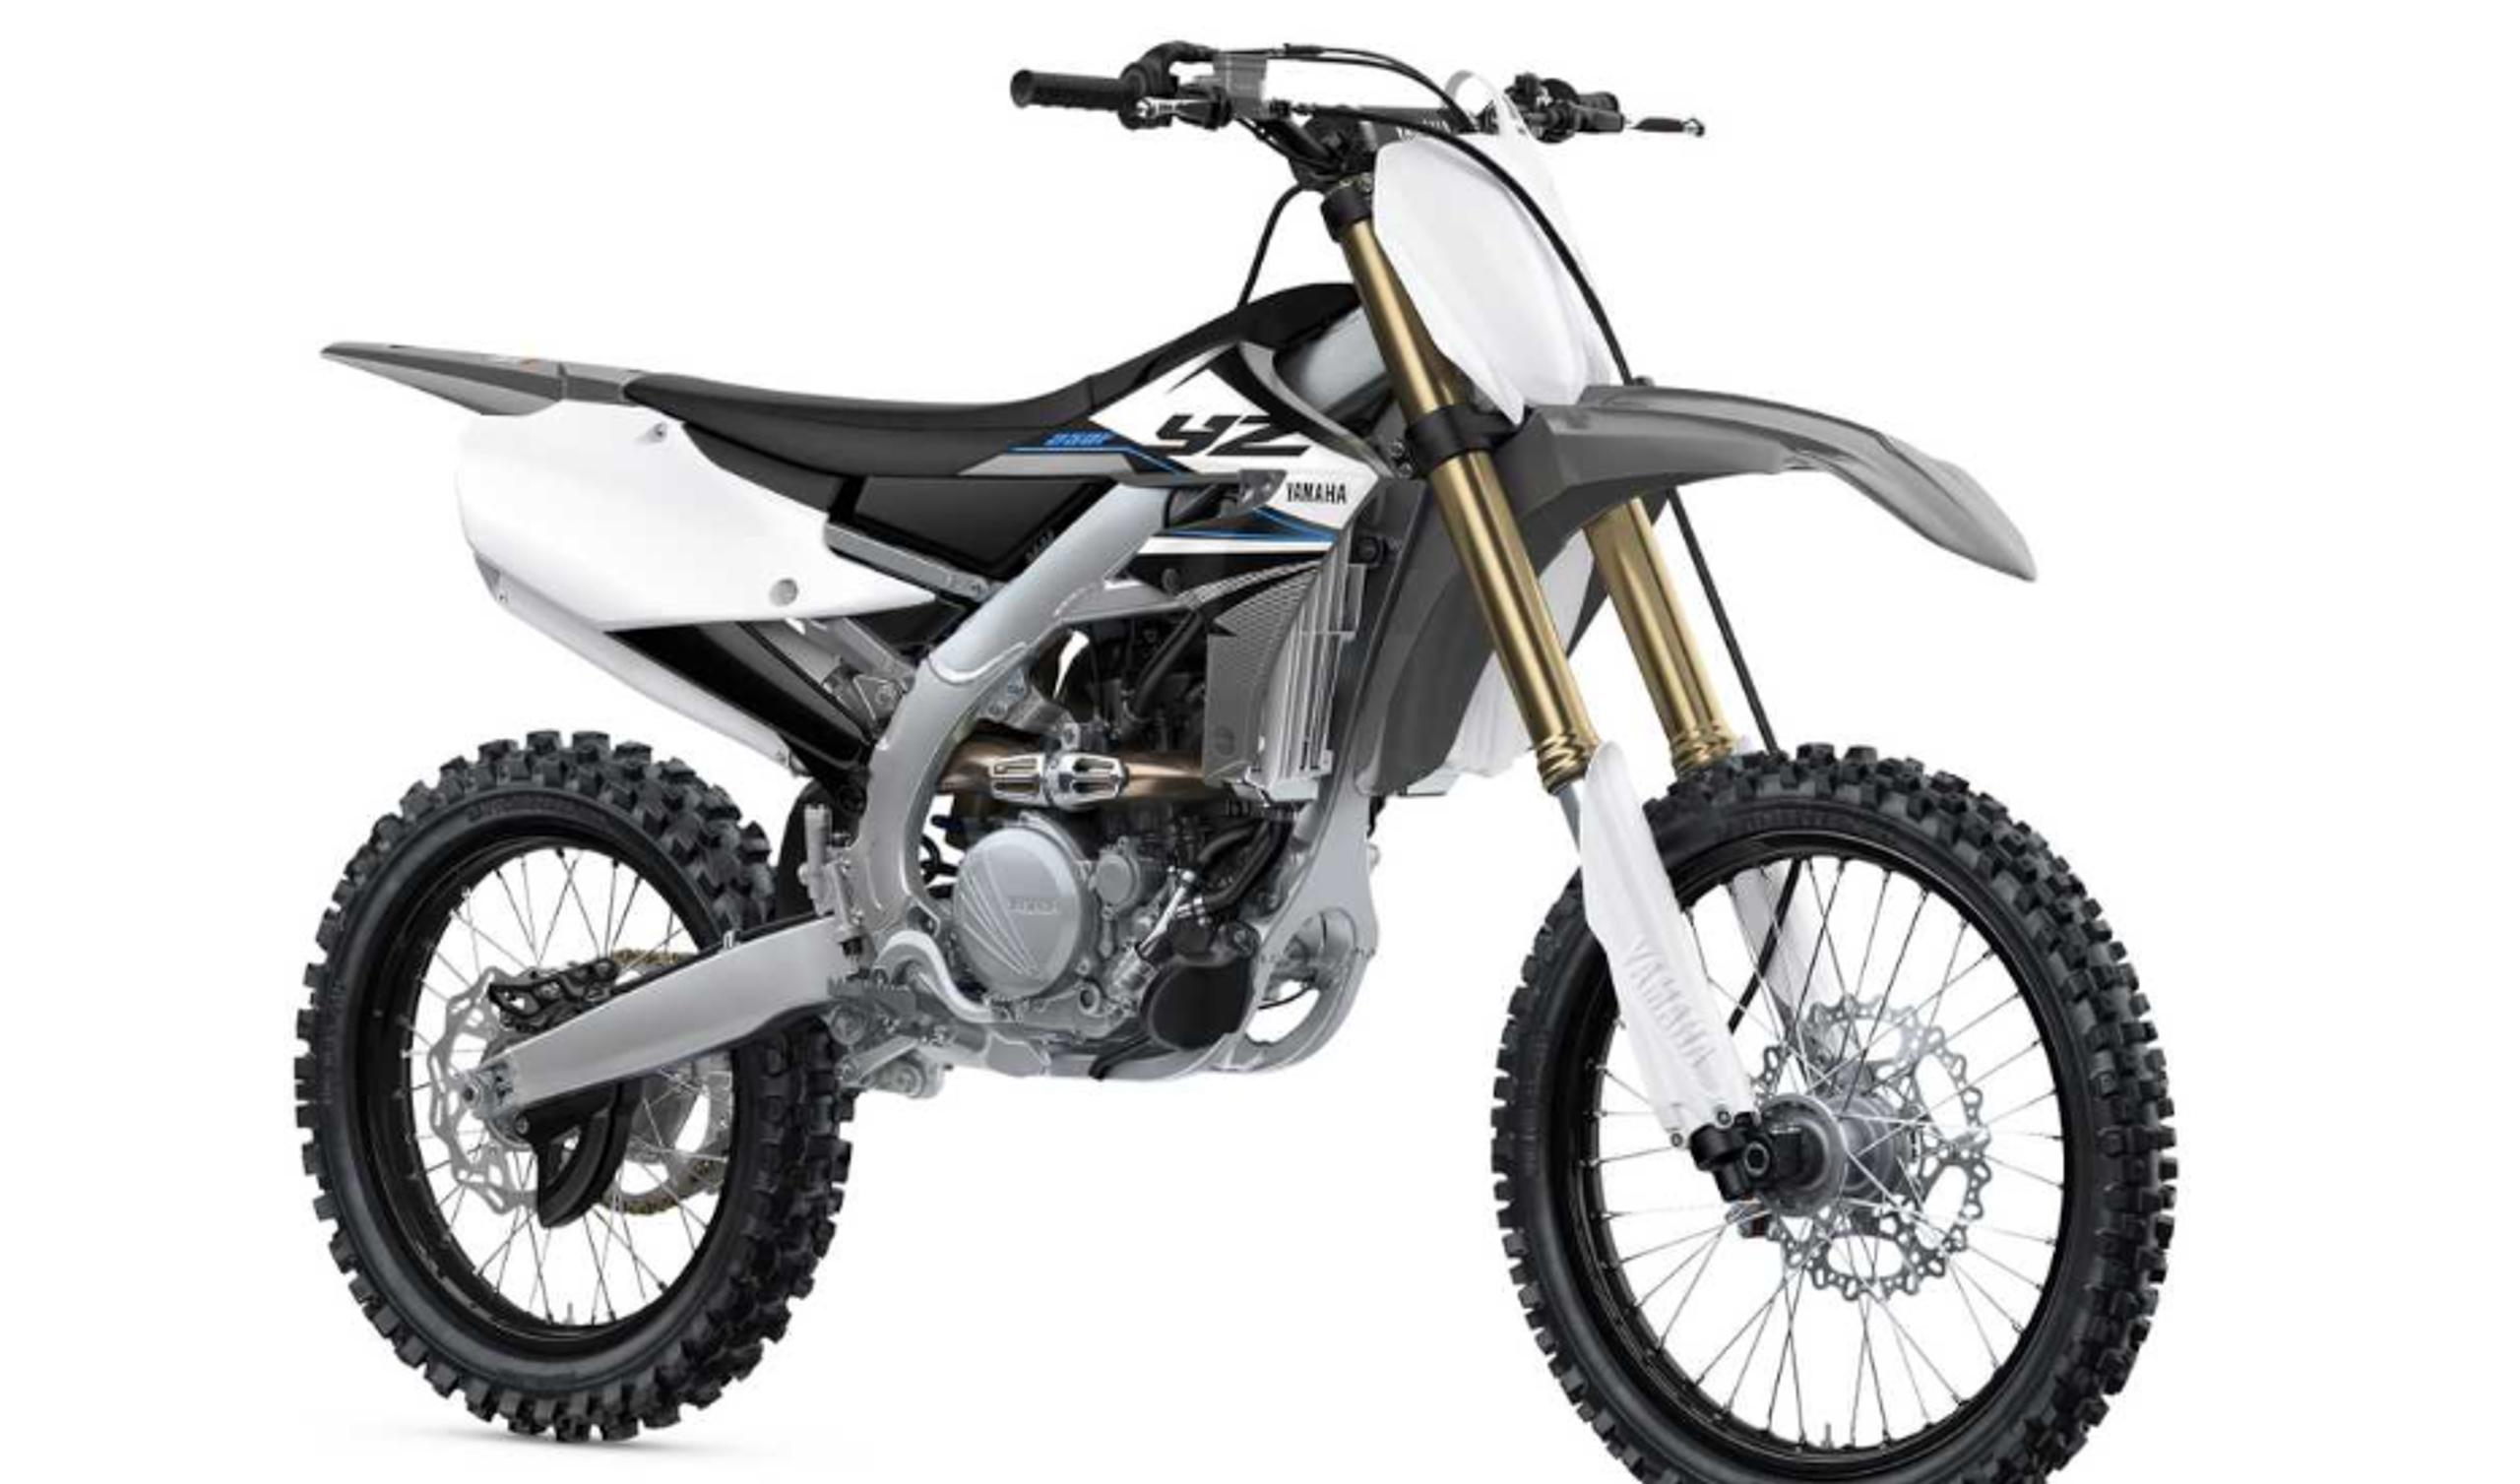 Yamaha Announces Mx Lineup Of Motorcycles